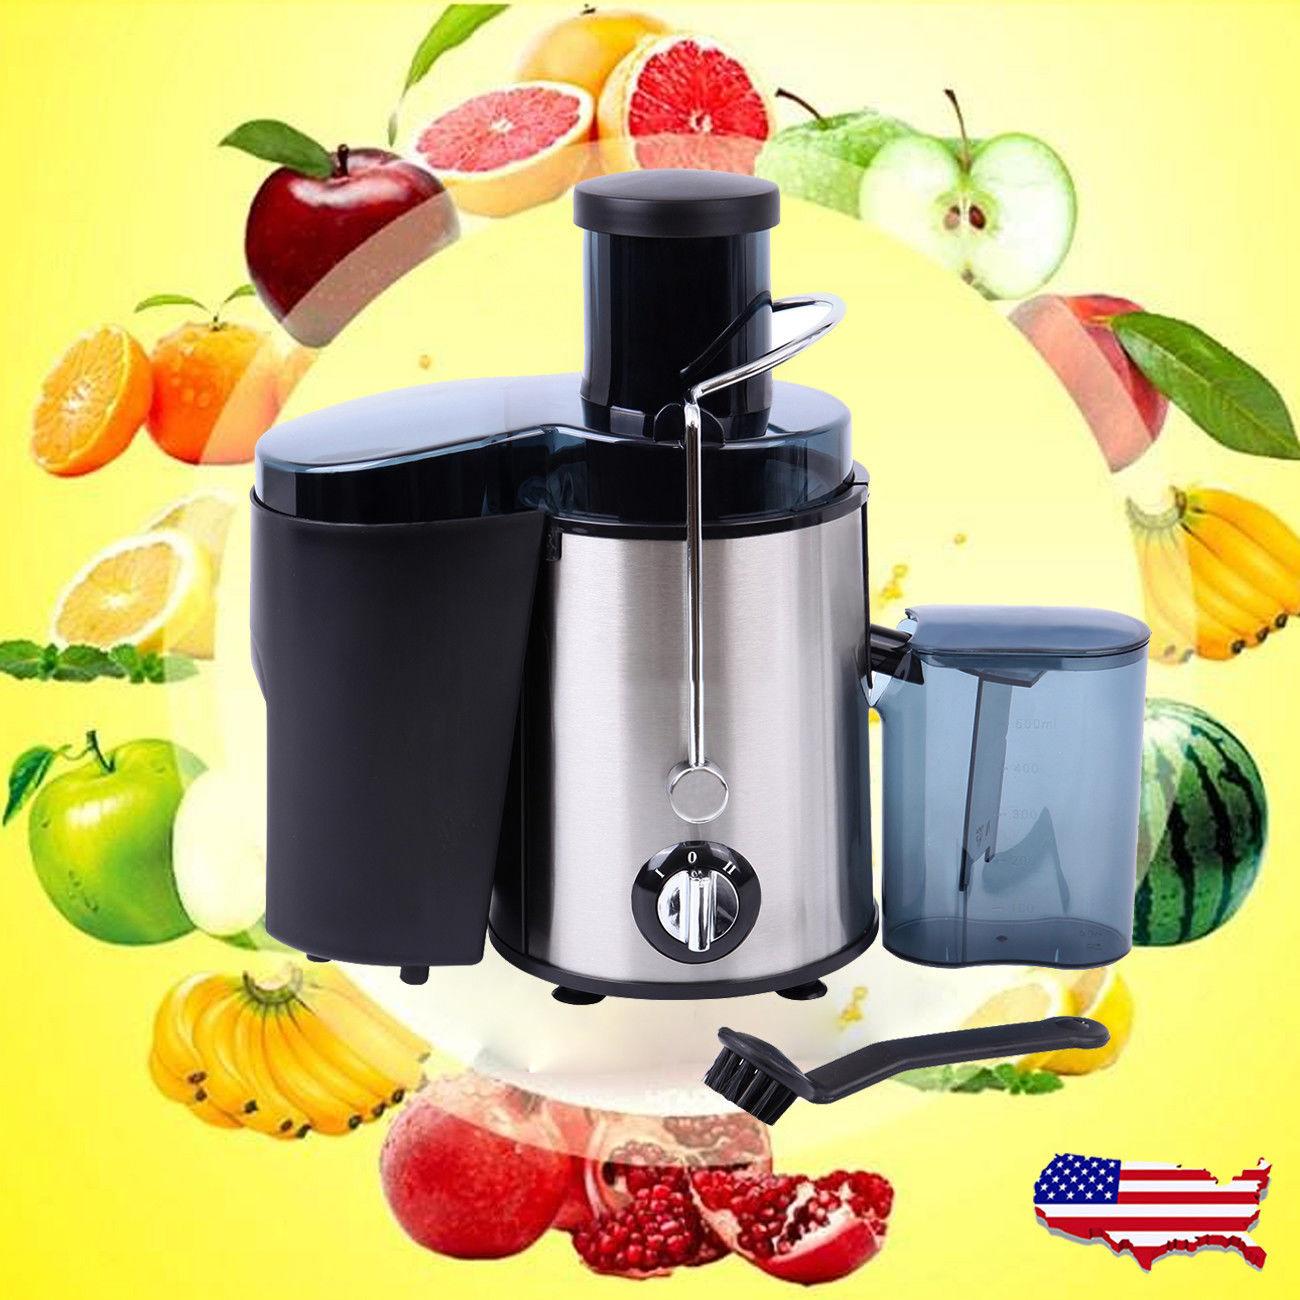 Fmc Jbt Food Tech Ppj Produce Plus Vegetable Fruit Juicer Excellent Quality Restaurant & Food Service